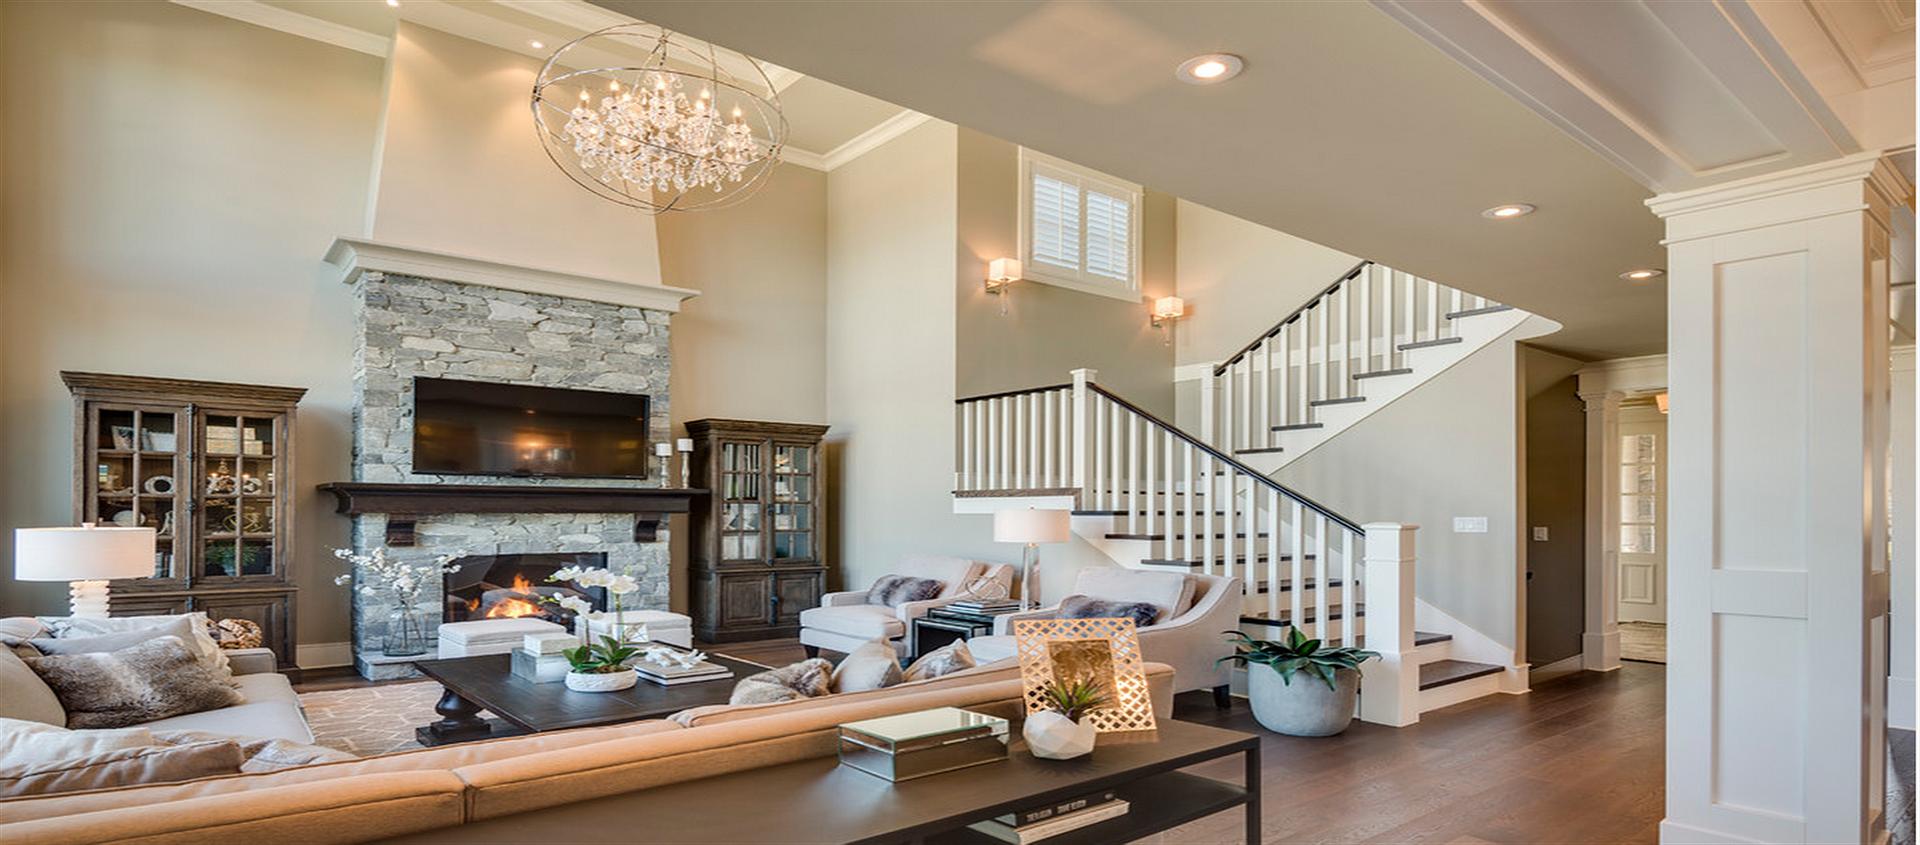 Bekend 10 dingen die je kan vinden elke landelijke stijl woonkamer - Woon &AW16